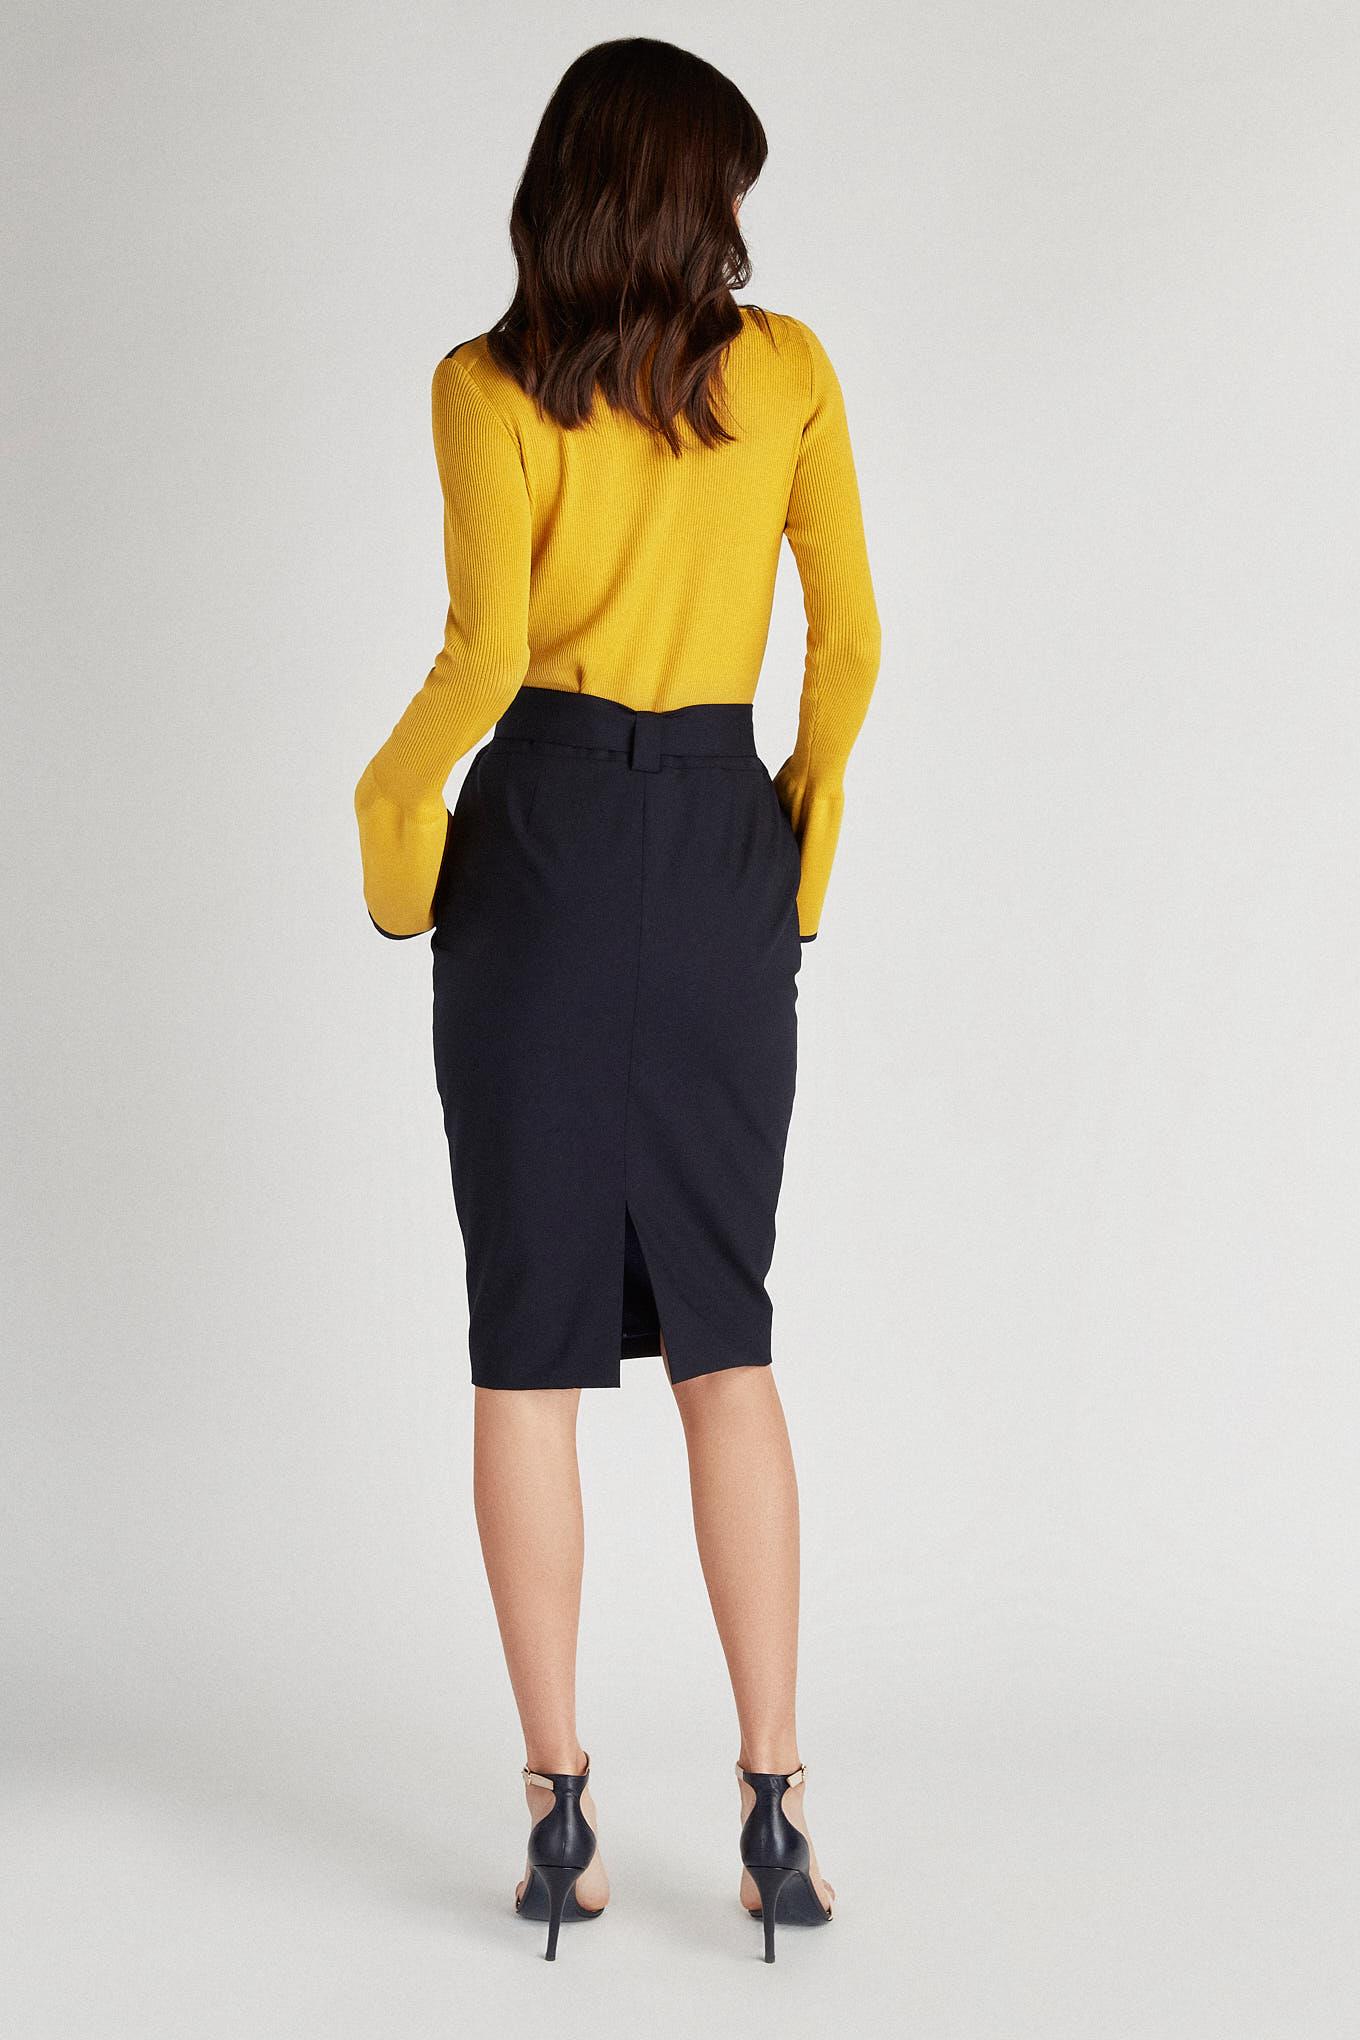 Malha Amarelo Casual Mulher